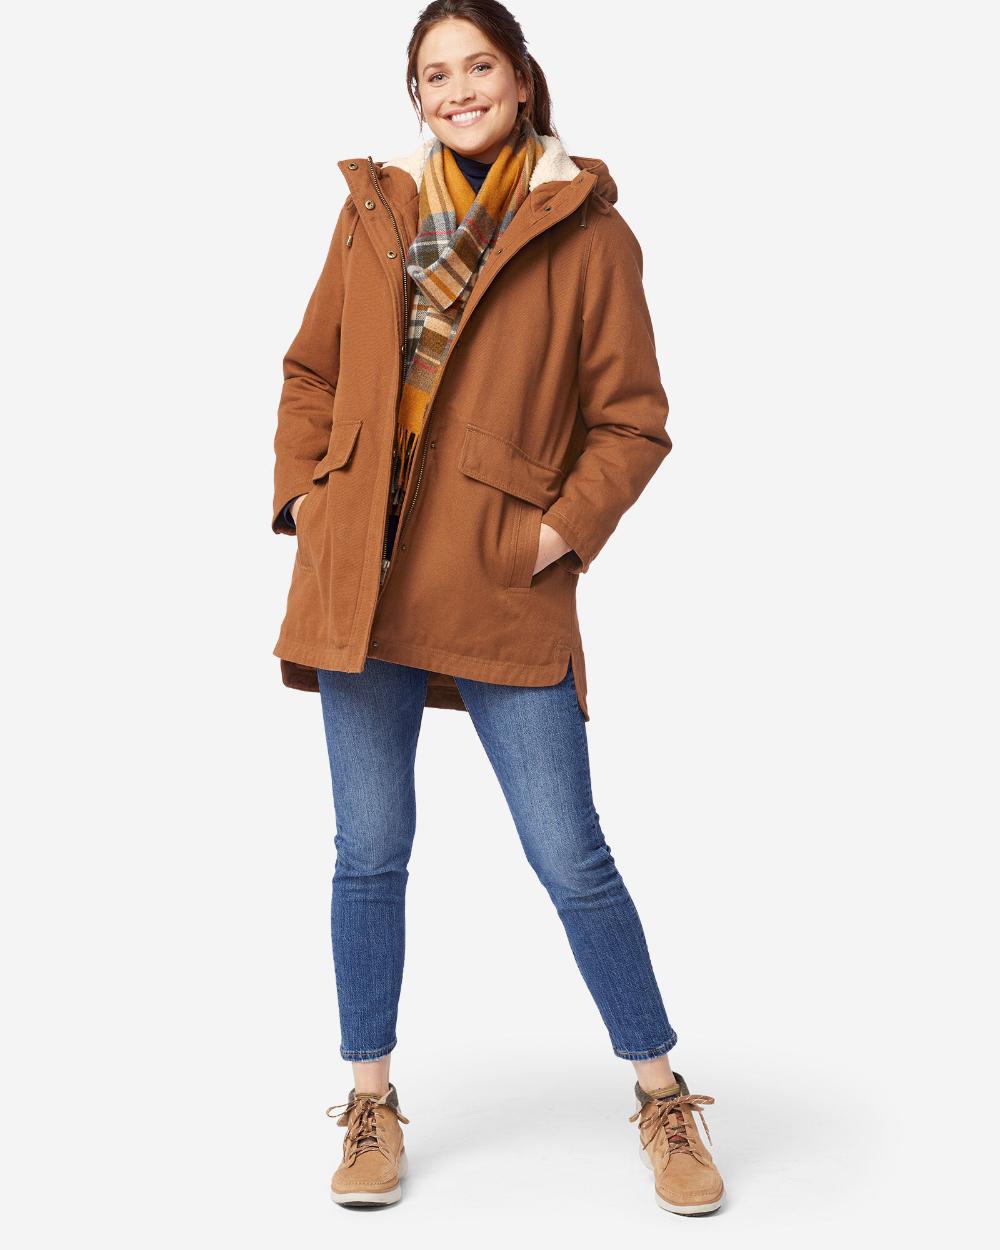 Women S Florence A Line Hooded Coat Pendleton Hooded Coat Womens Fall Coats Fall Fashion Coats [ 1250 x 1000 Pixel ]